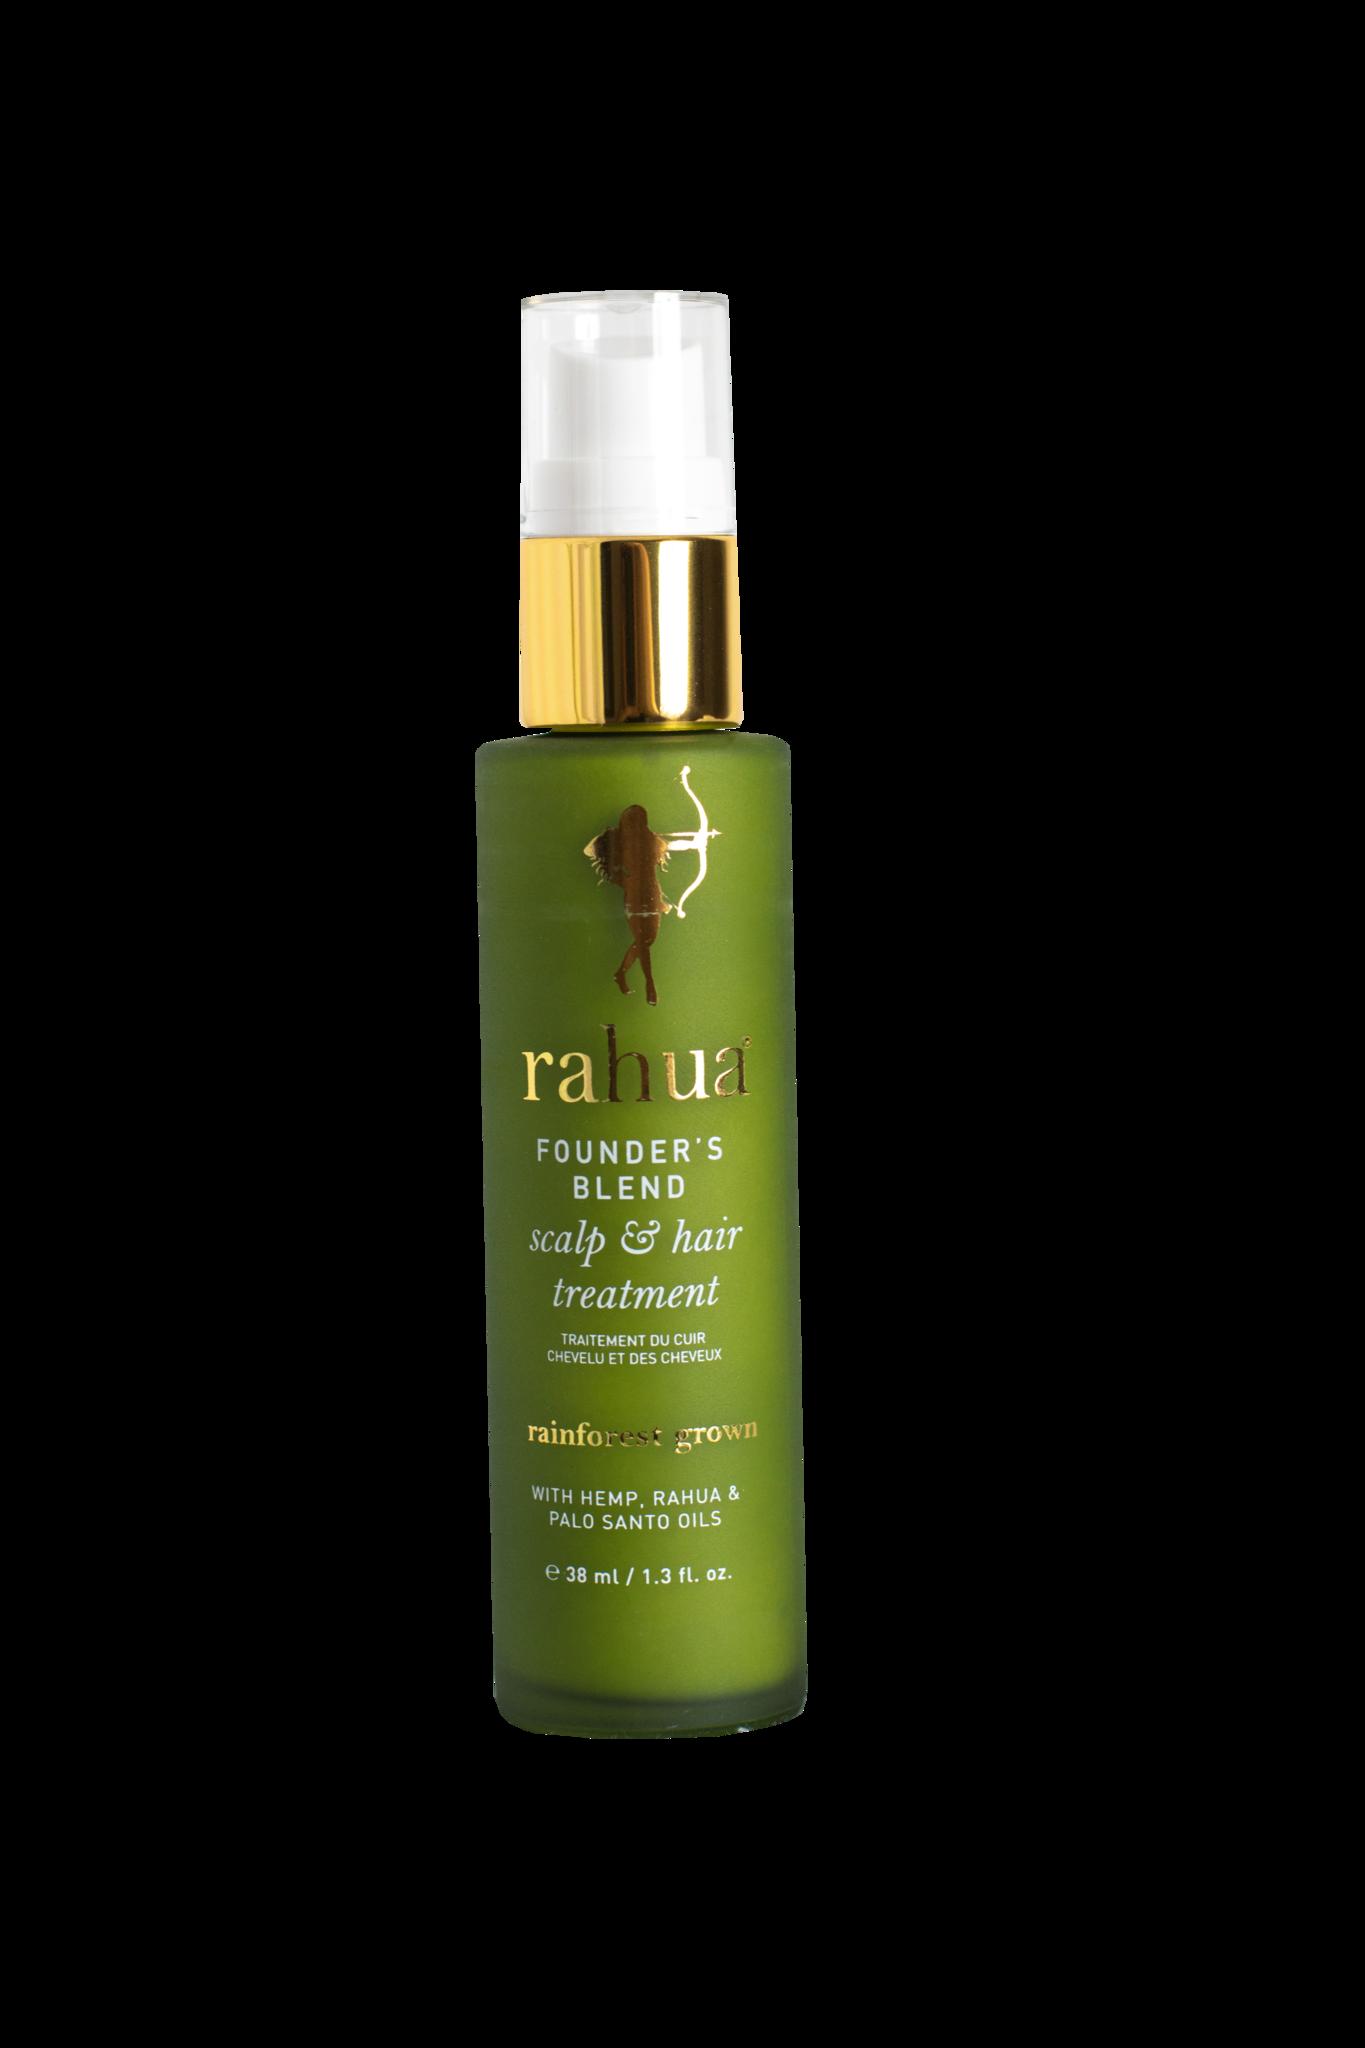 Founder's Blend Scalp & Hair Treatment - Rahua